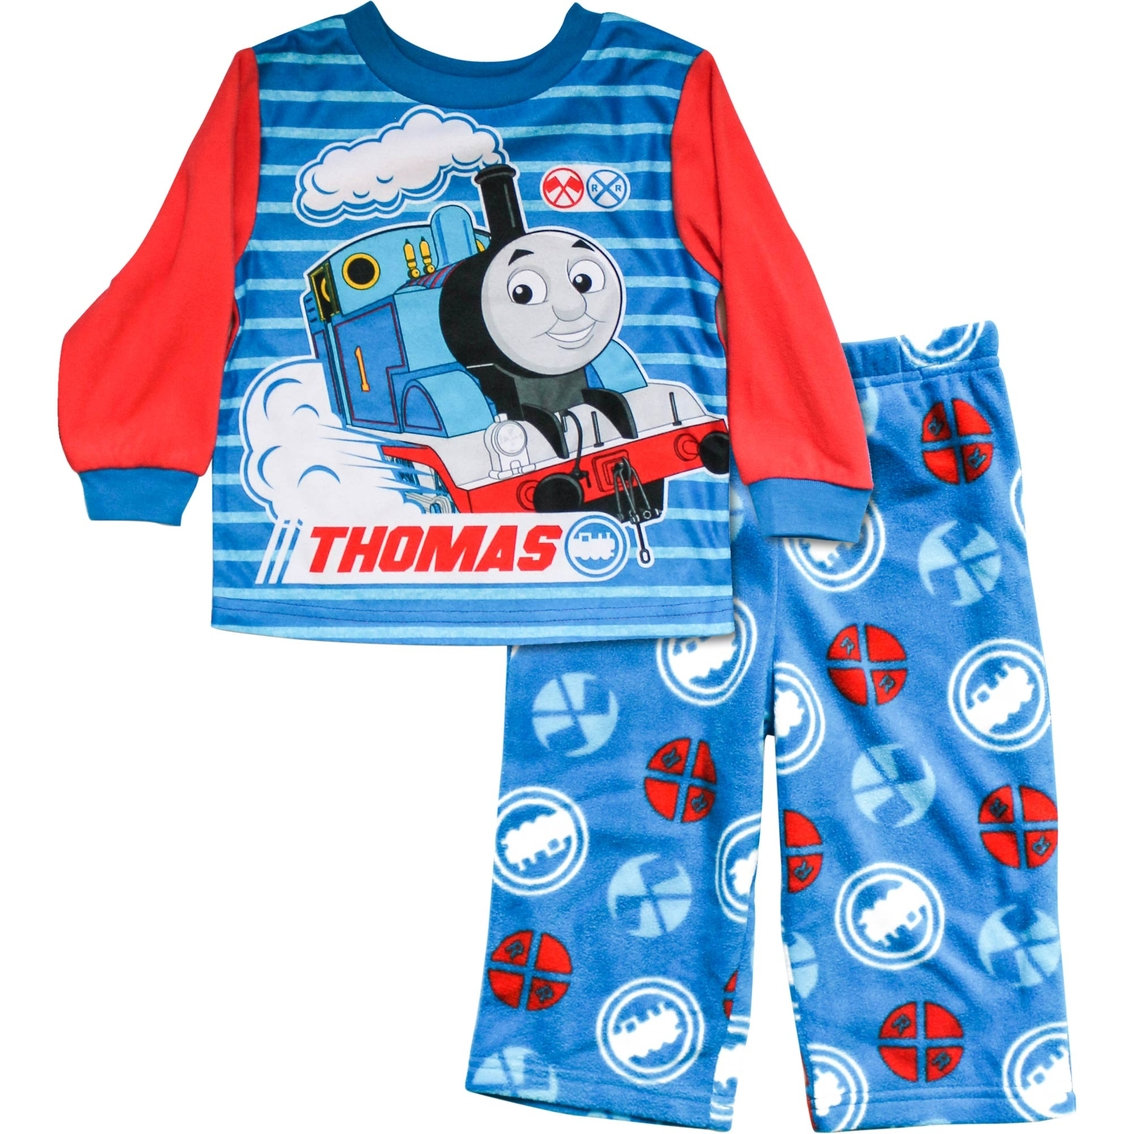 4c4a945e4 Thomas   Friends Infant Boys Thomas The Train 2 Pc. Pajama Set ...